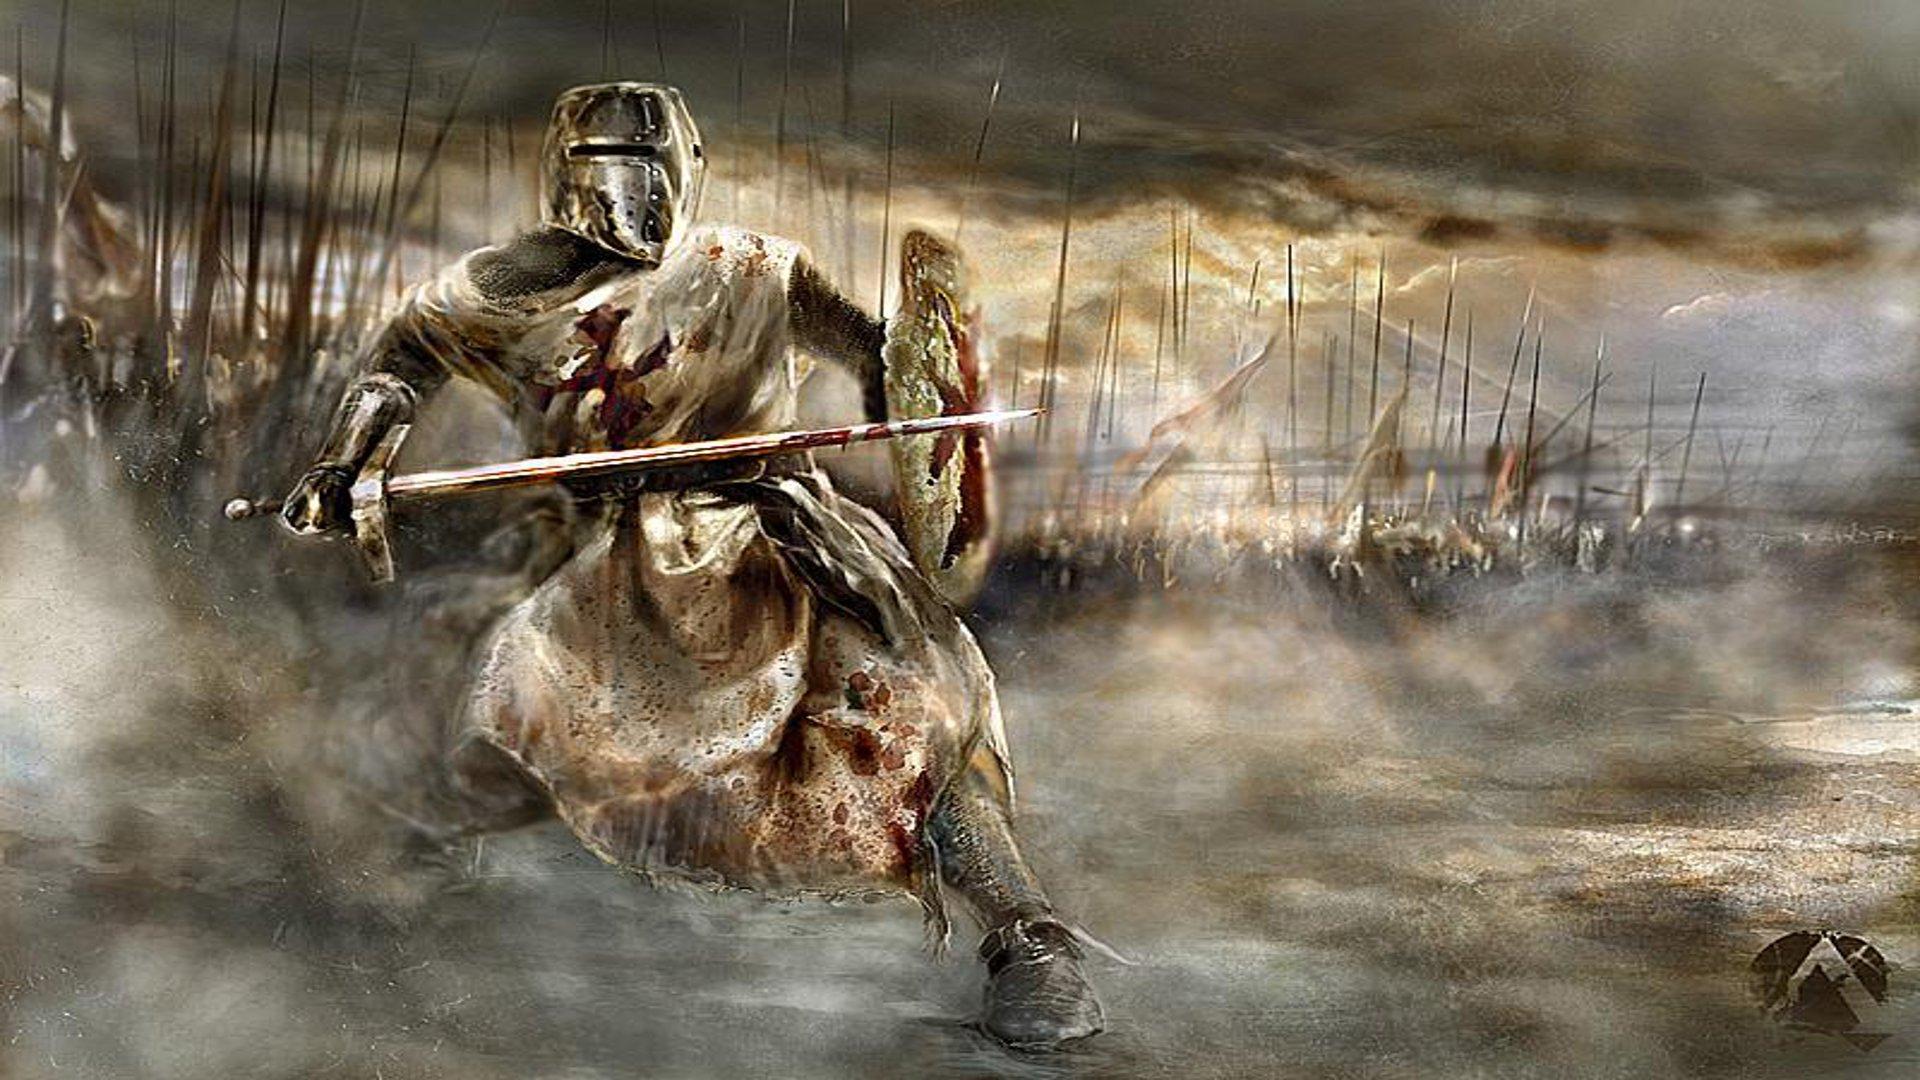 Crusader Knight Wallpaper 1920x1080 Crusader Knight 1920x1080